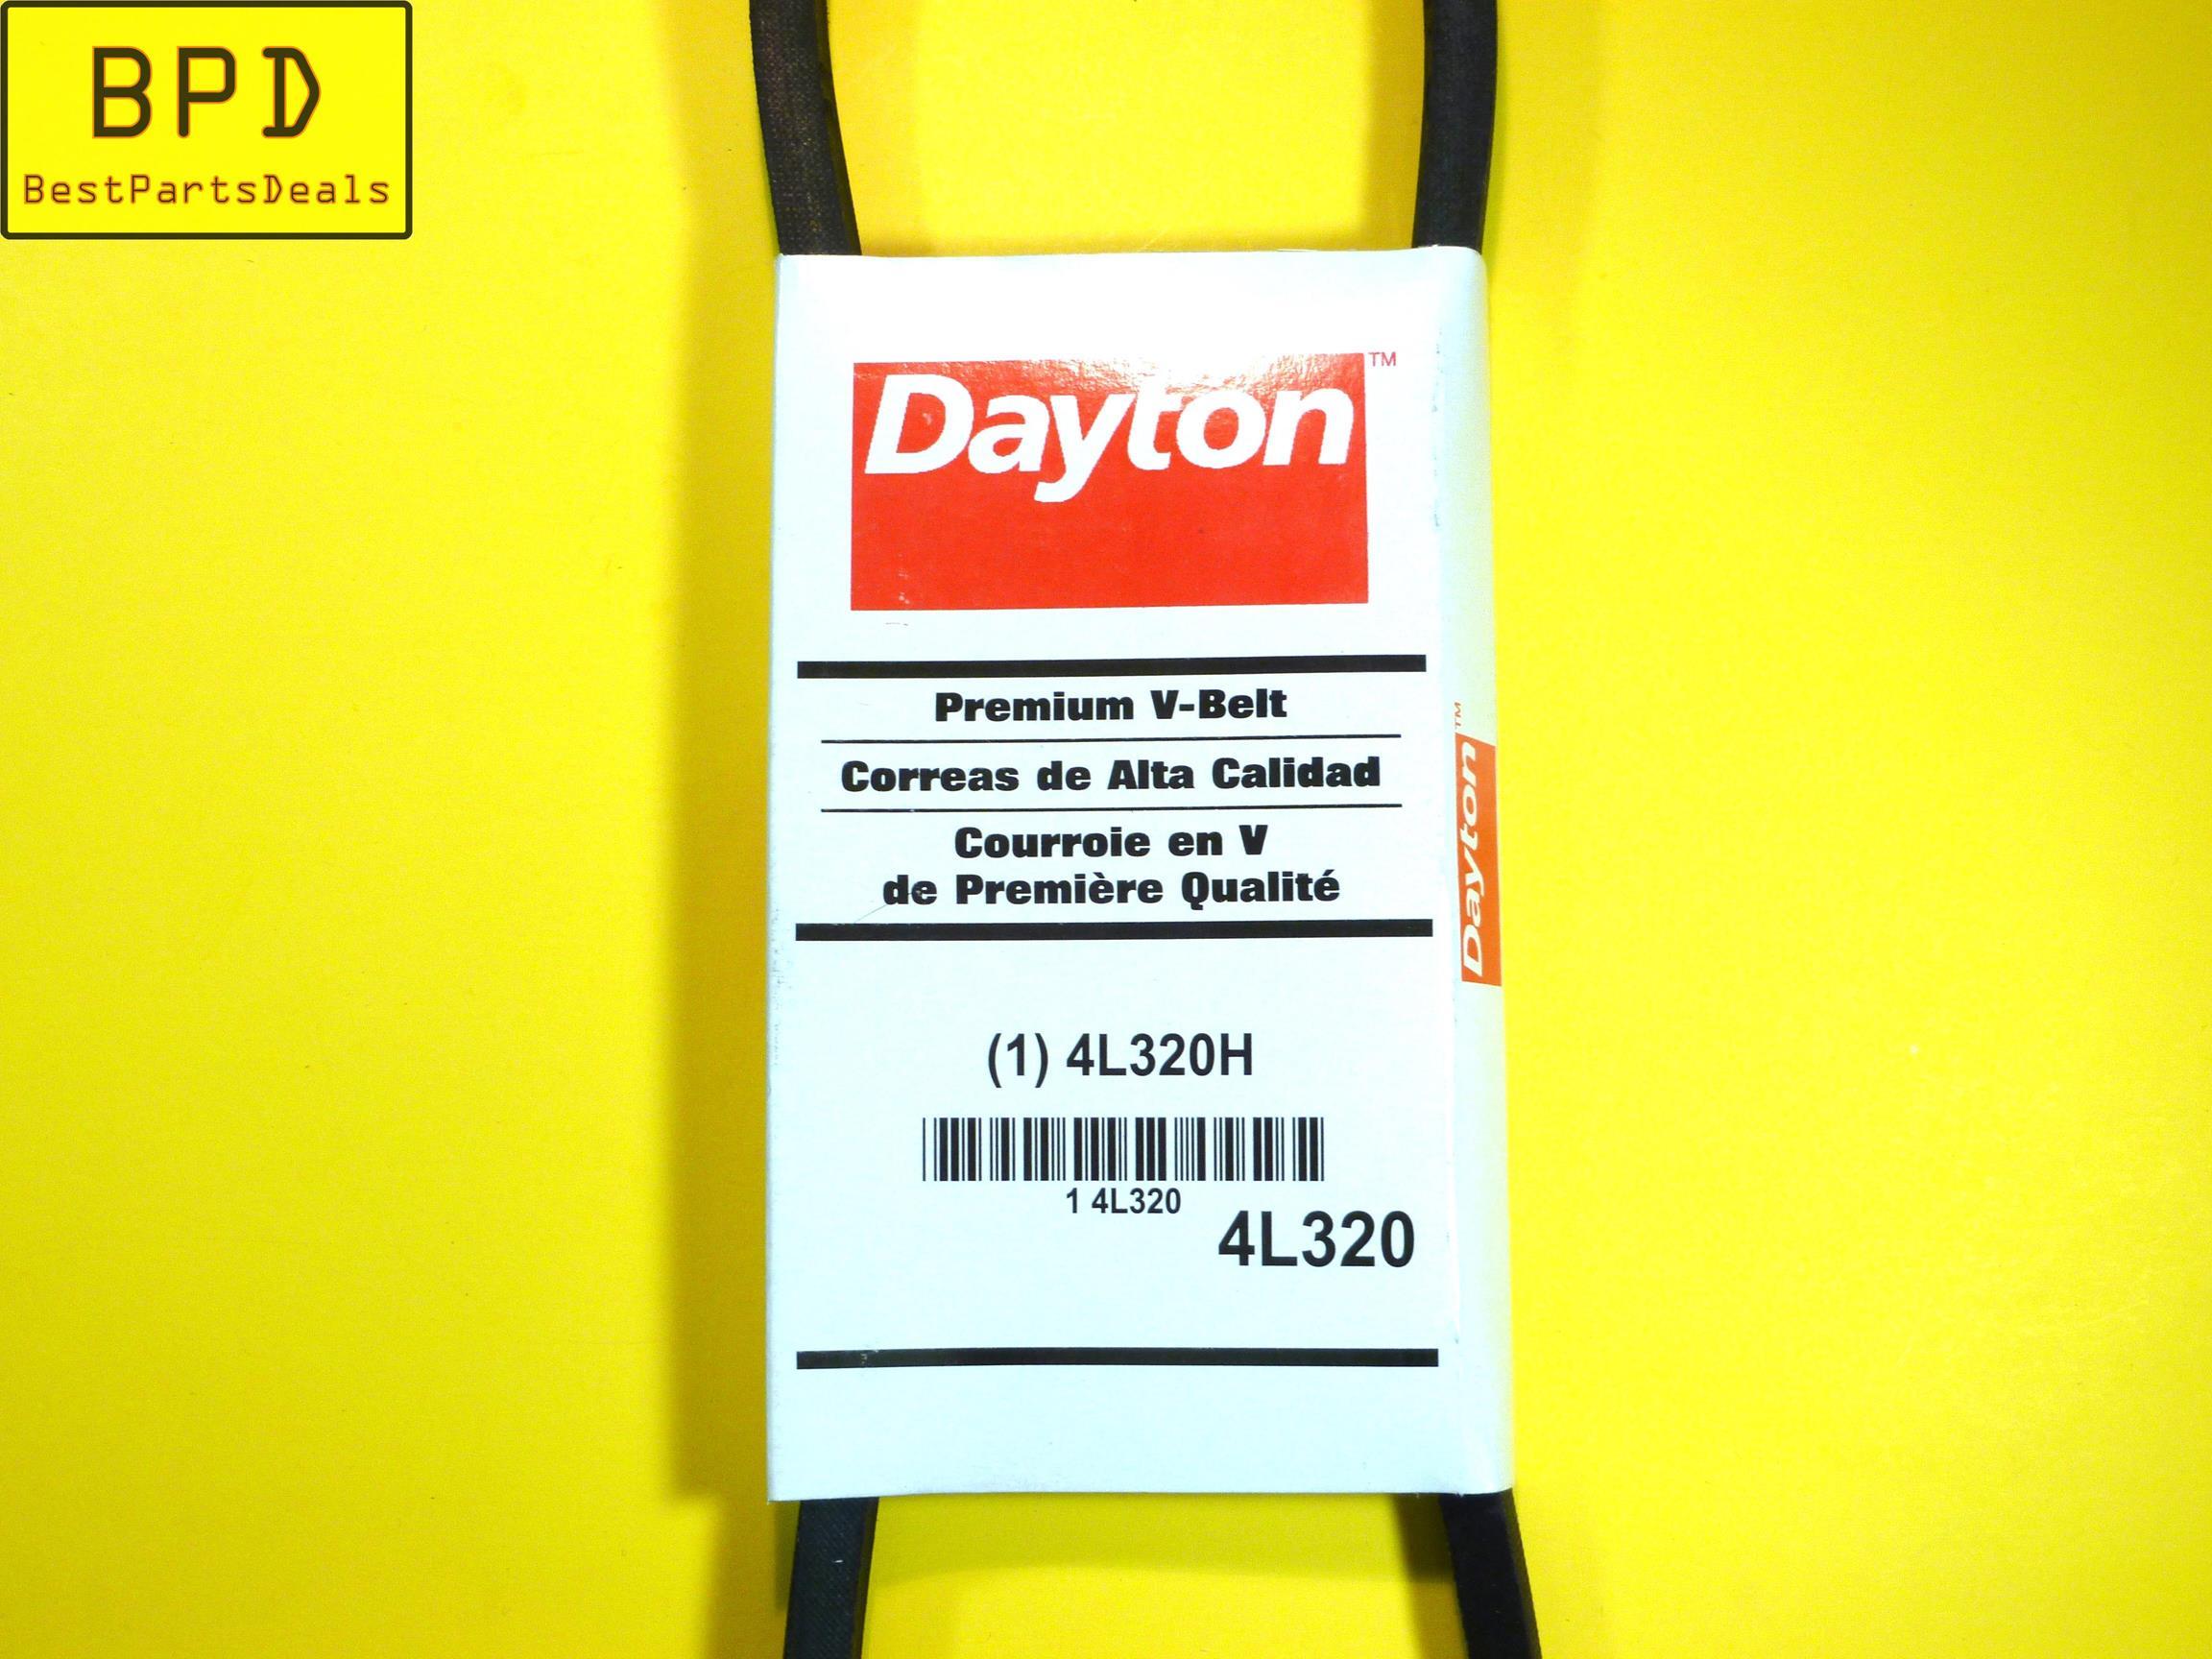 variable pack EU origin ID x cross,mm O-ring material 74 x 2 DIN 3770